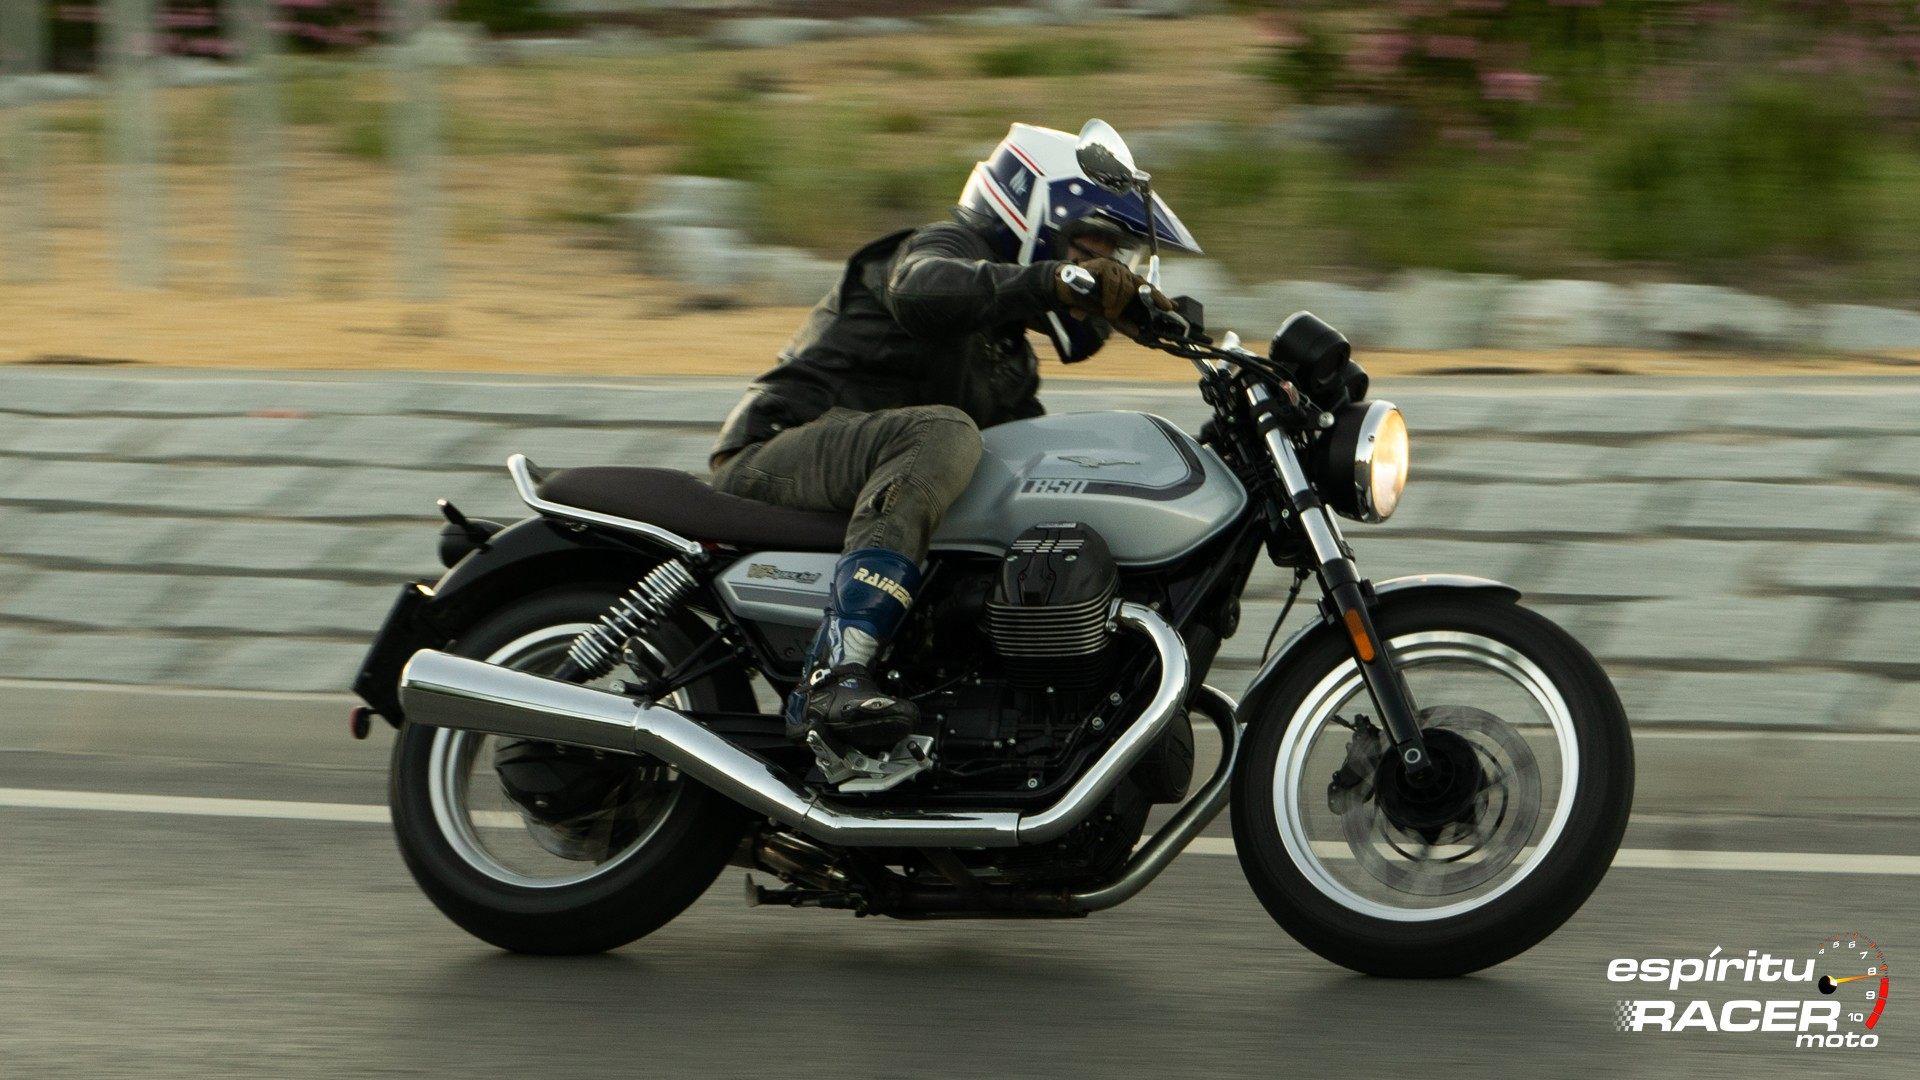 Moto Guzzi V7 850 Special 61